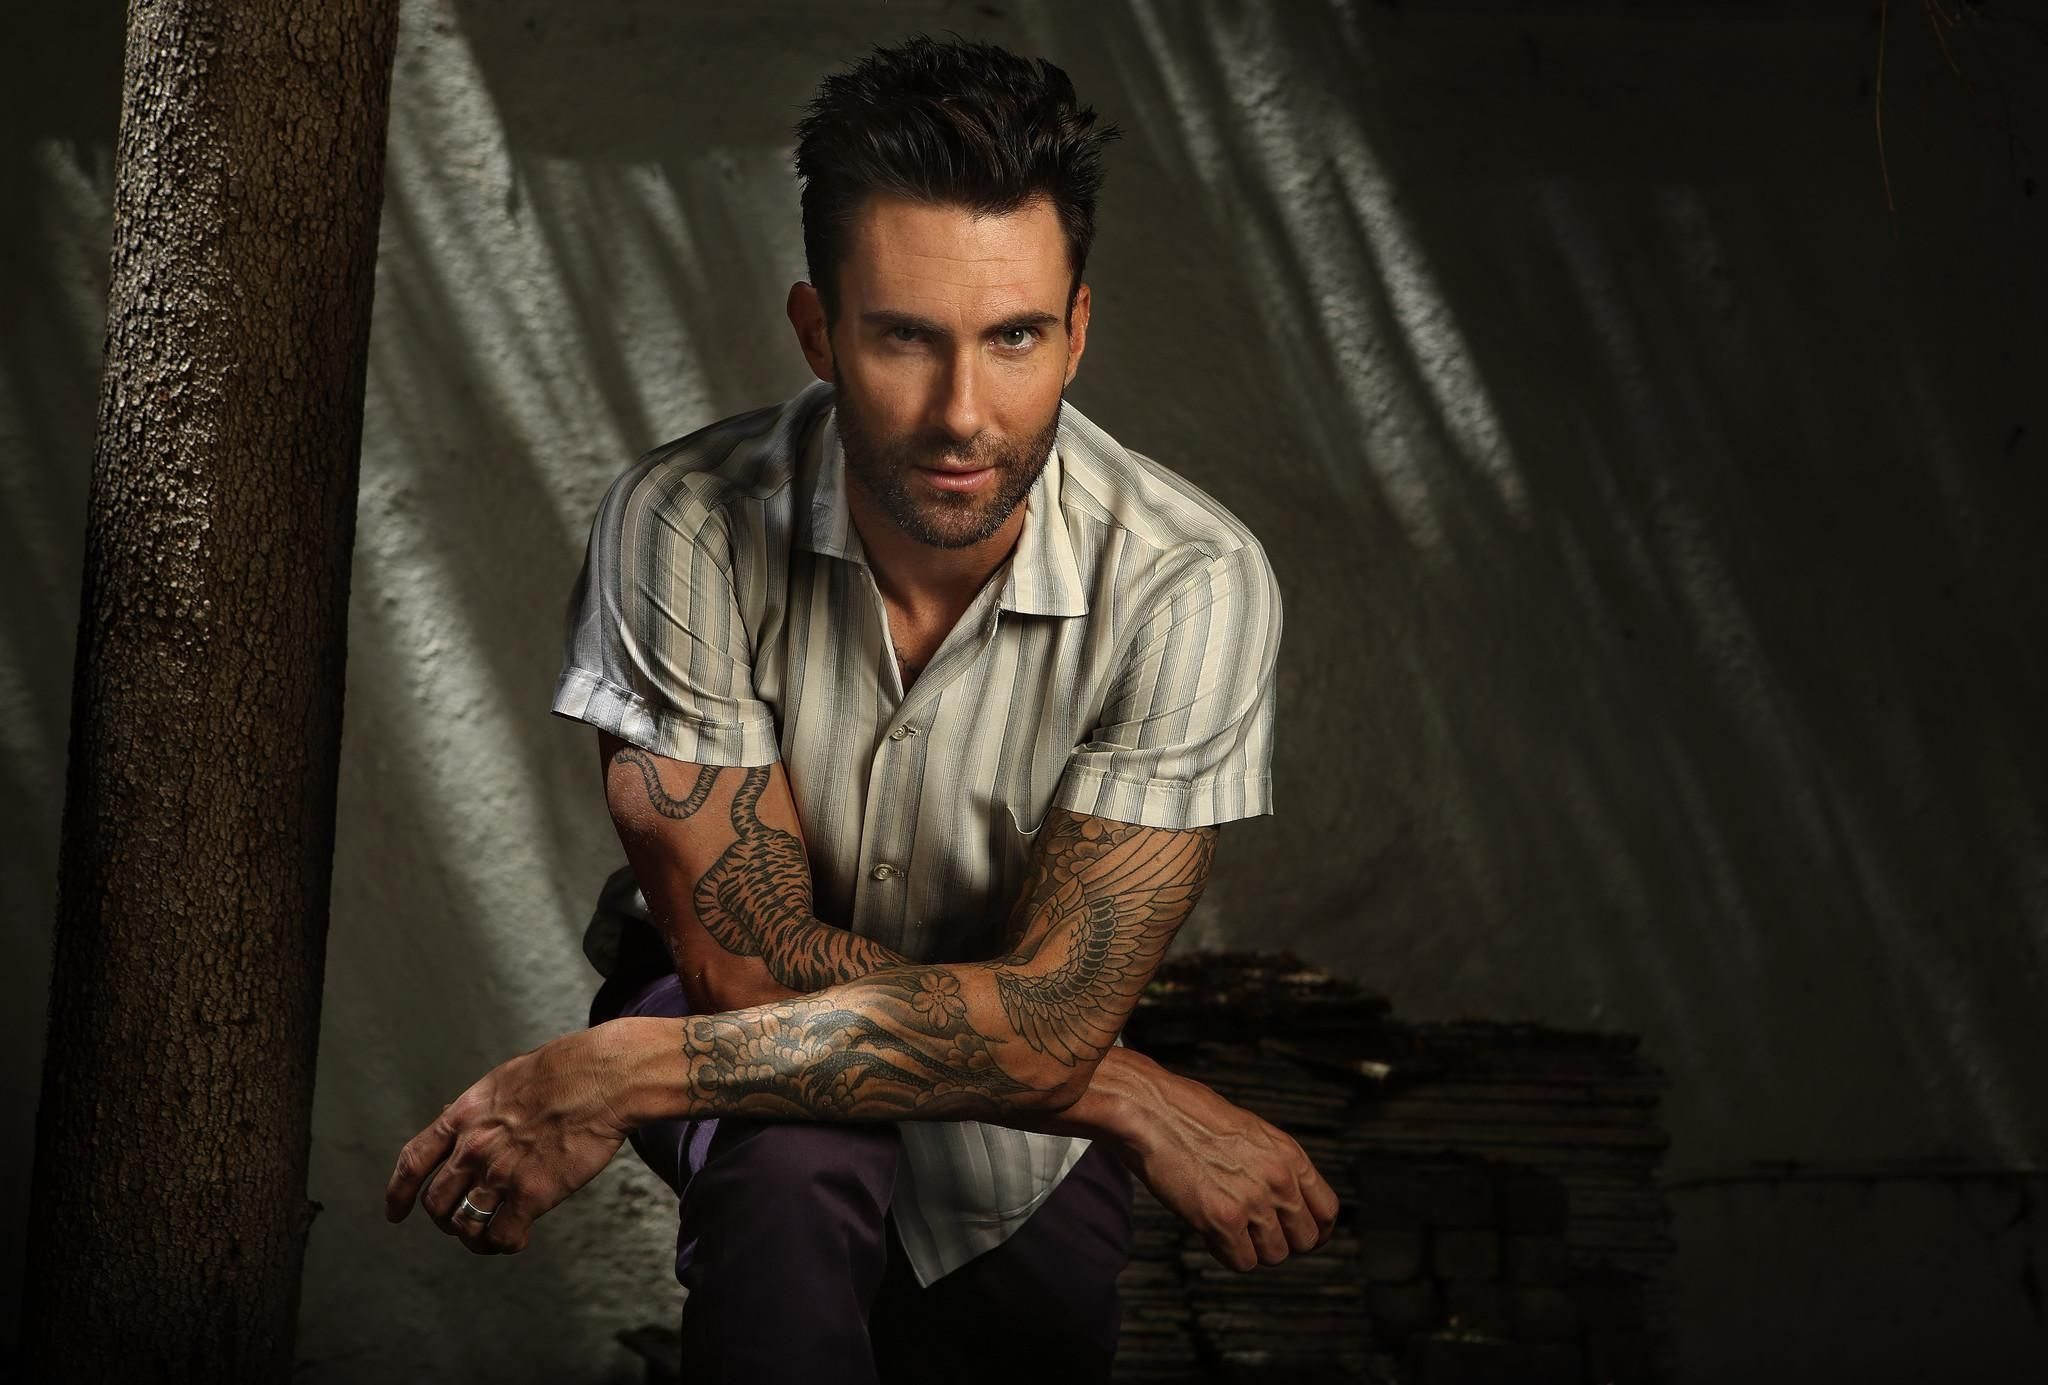 Pin By Markruse17 On Maroon 5 Wallpaper Adam Levine Maroon 5 Christina Perri